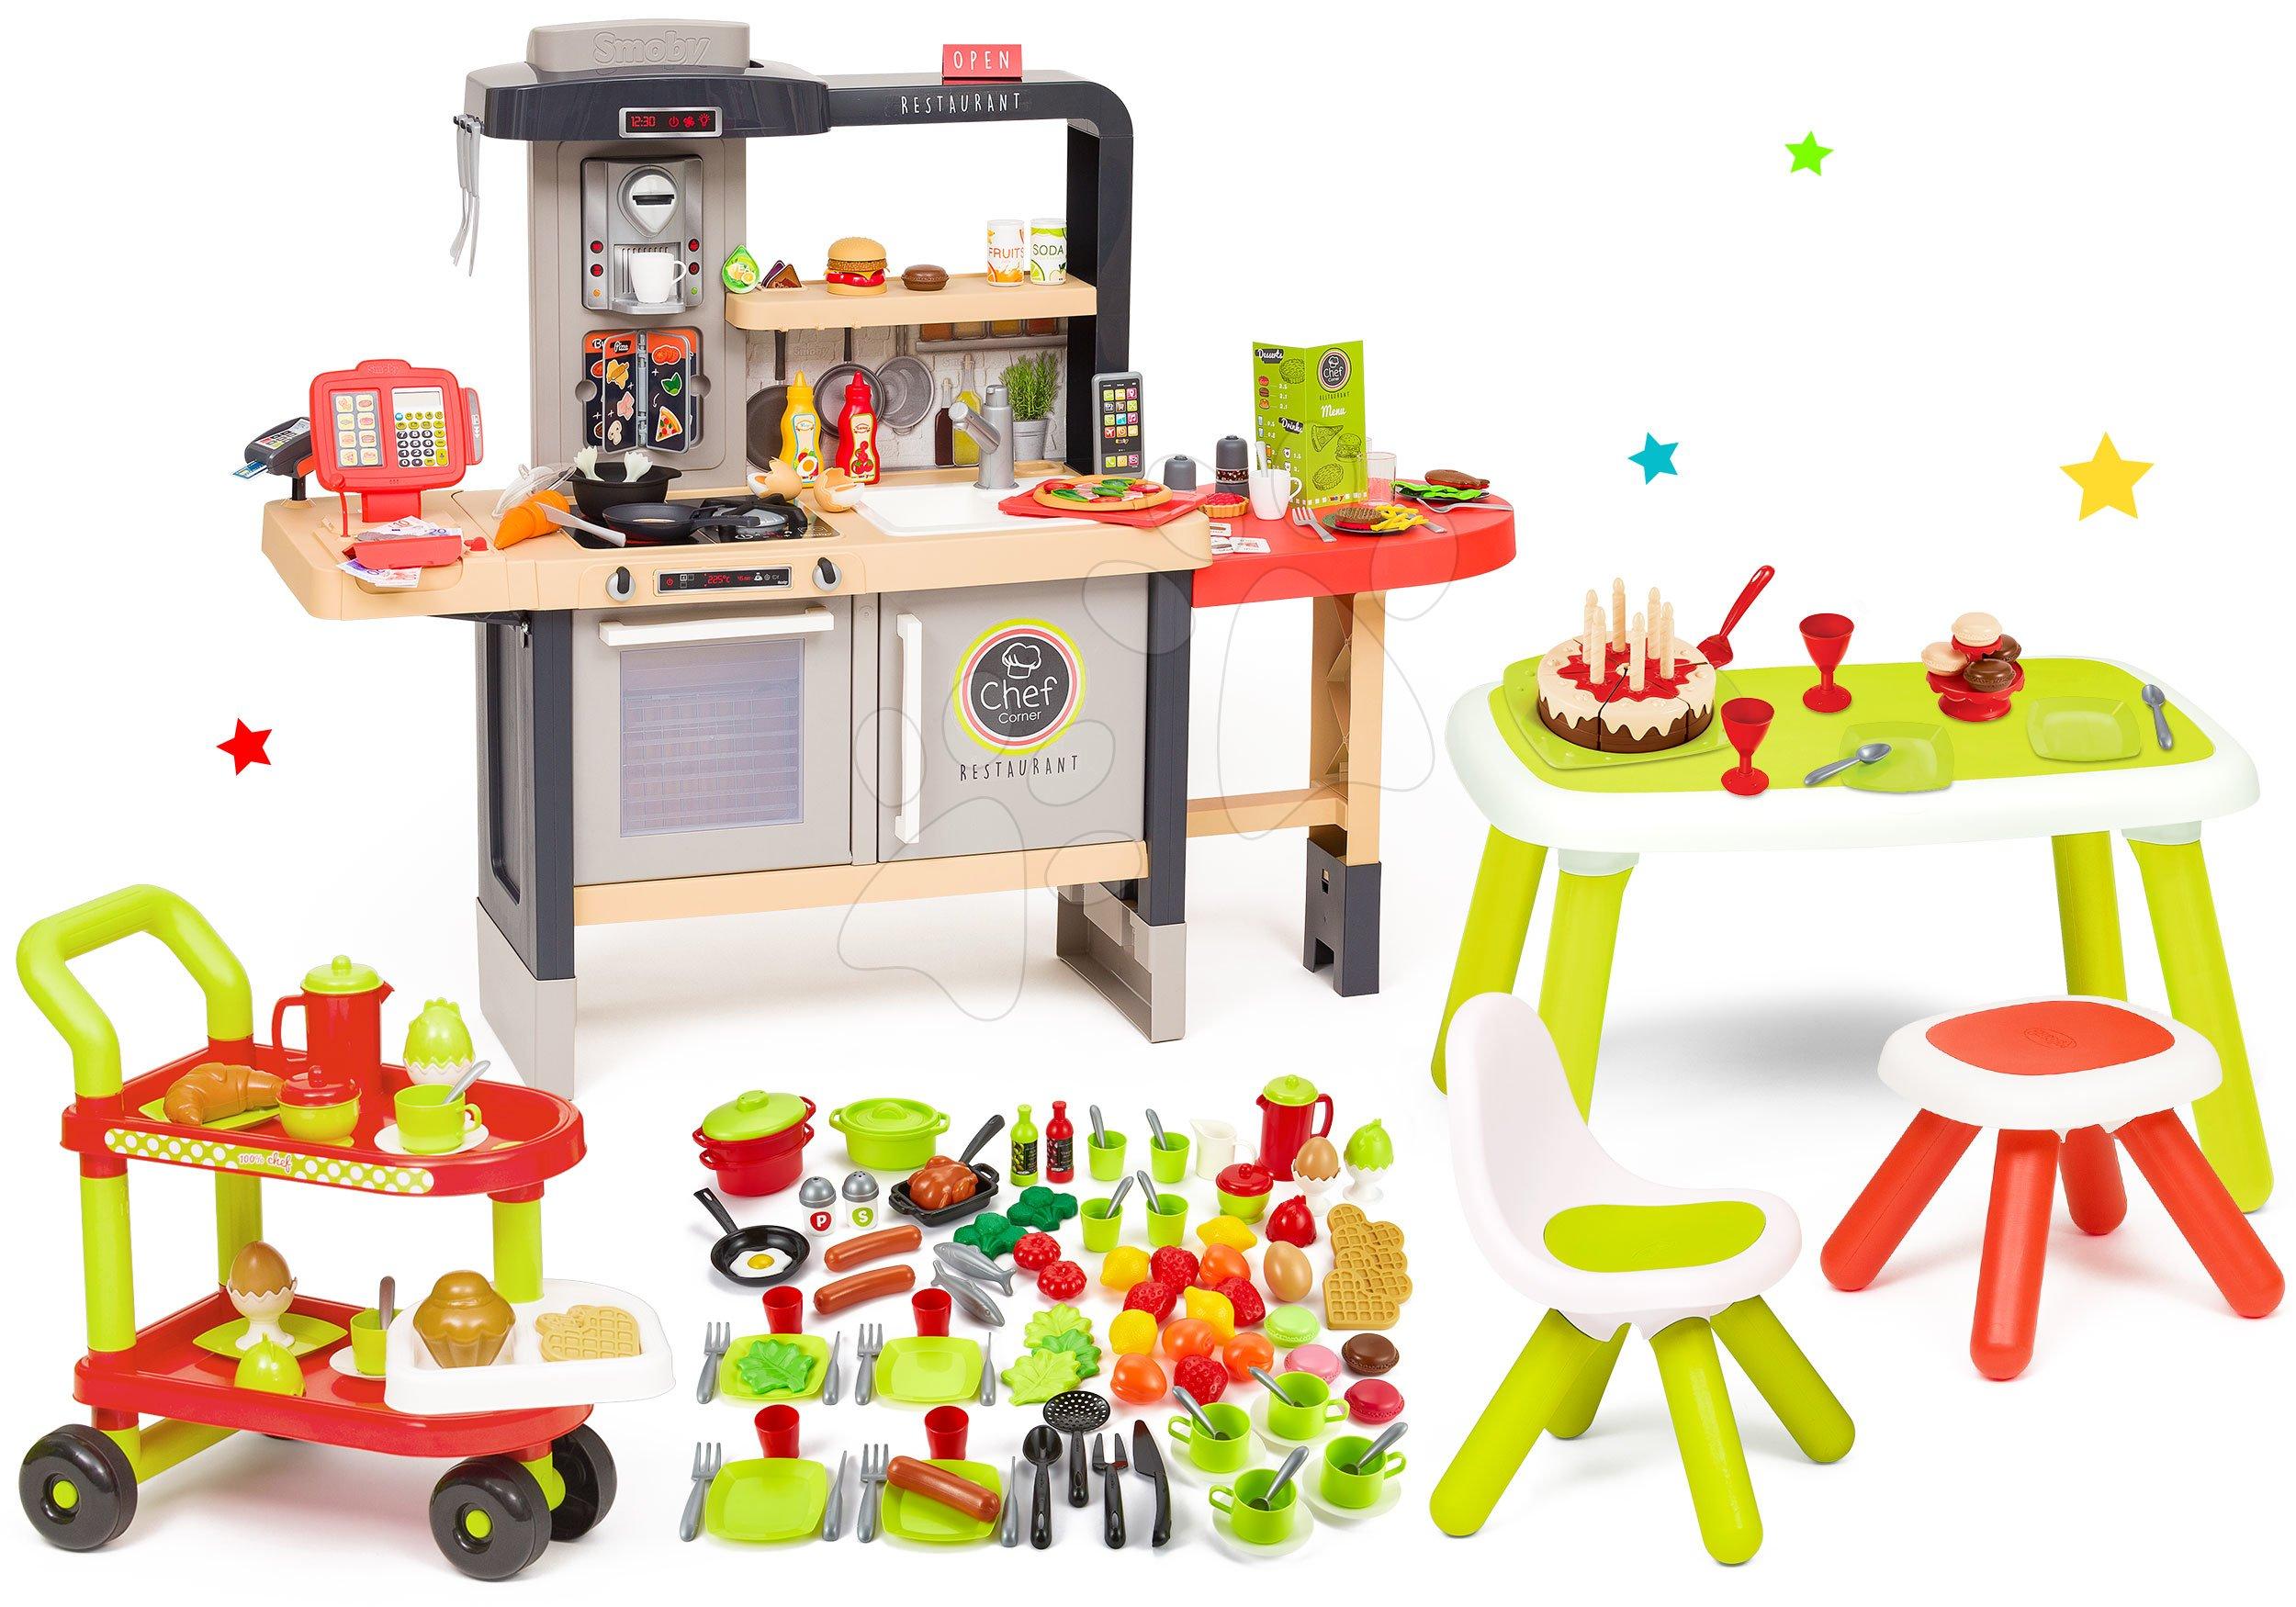 Set reštaurácia s elektronickou kuchynkou Chef Corner Restaurant Smoby a servírovací vozík s potravinami a narodeninová torta na stole so stoličkou